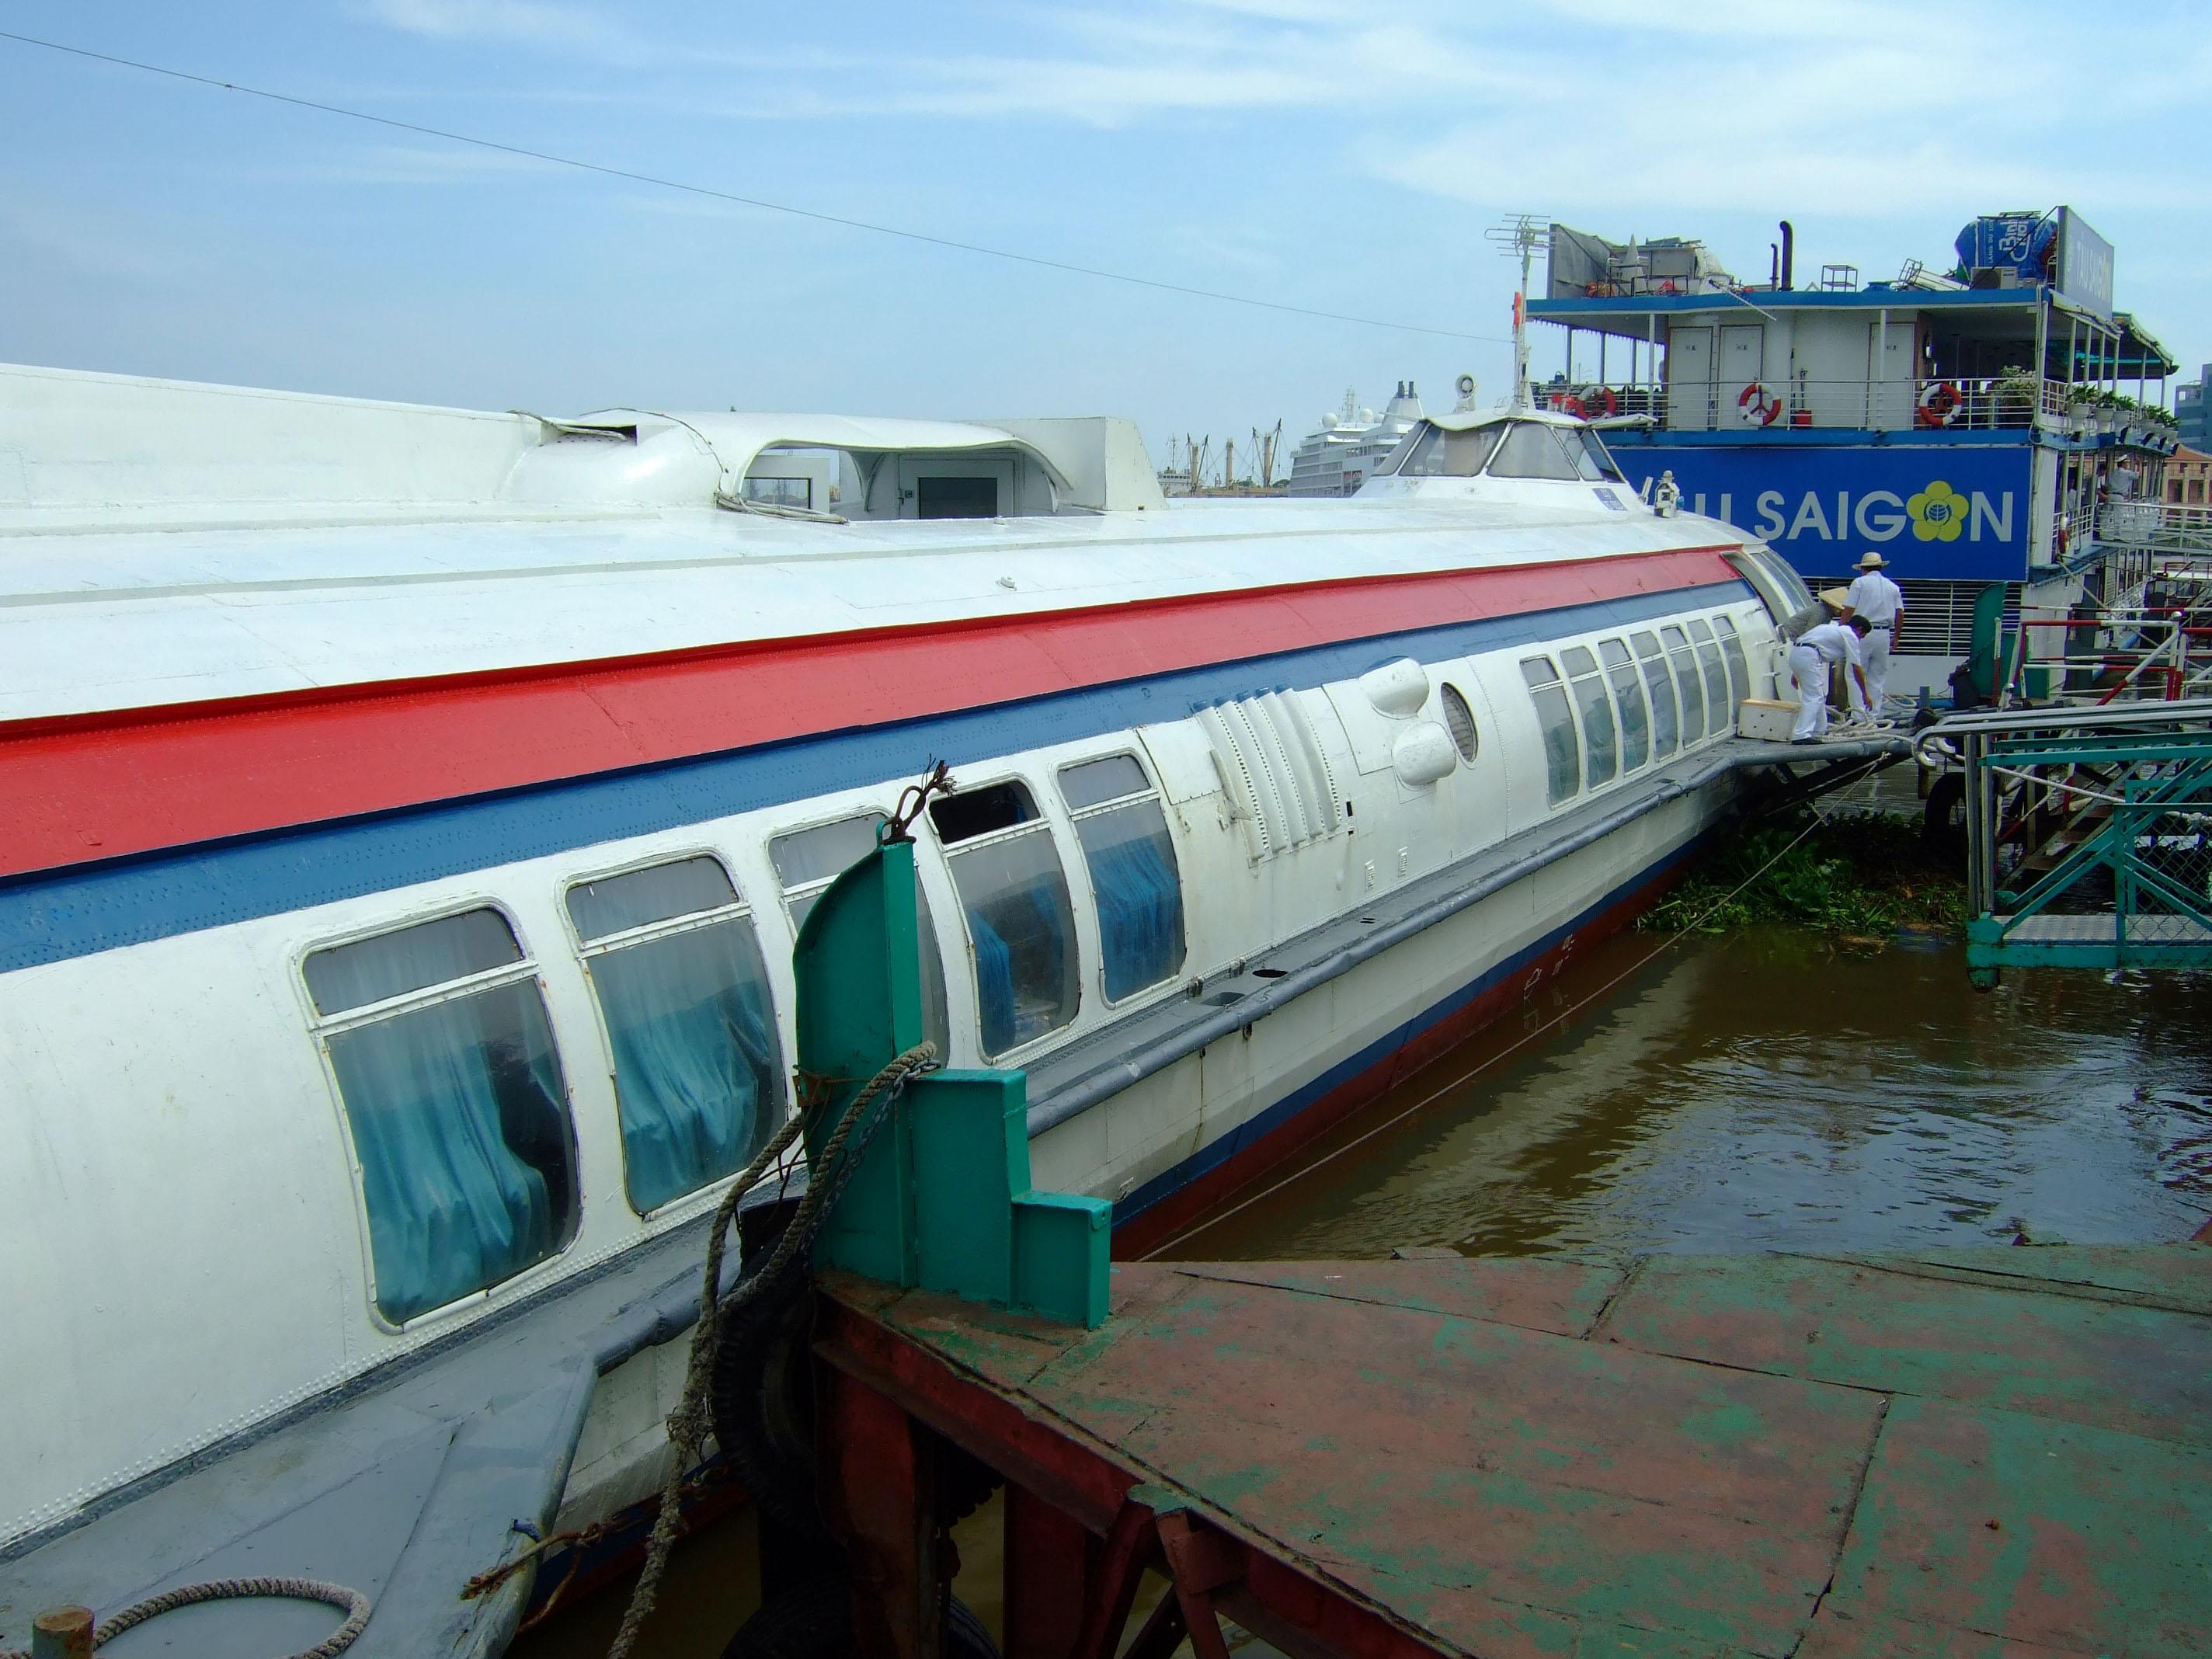 Vietnam Ho Chi Minh City Saigon harbor Ferries boats Feb 2009 41